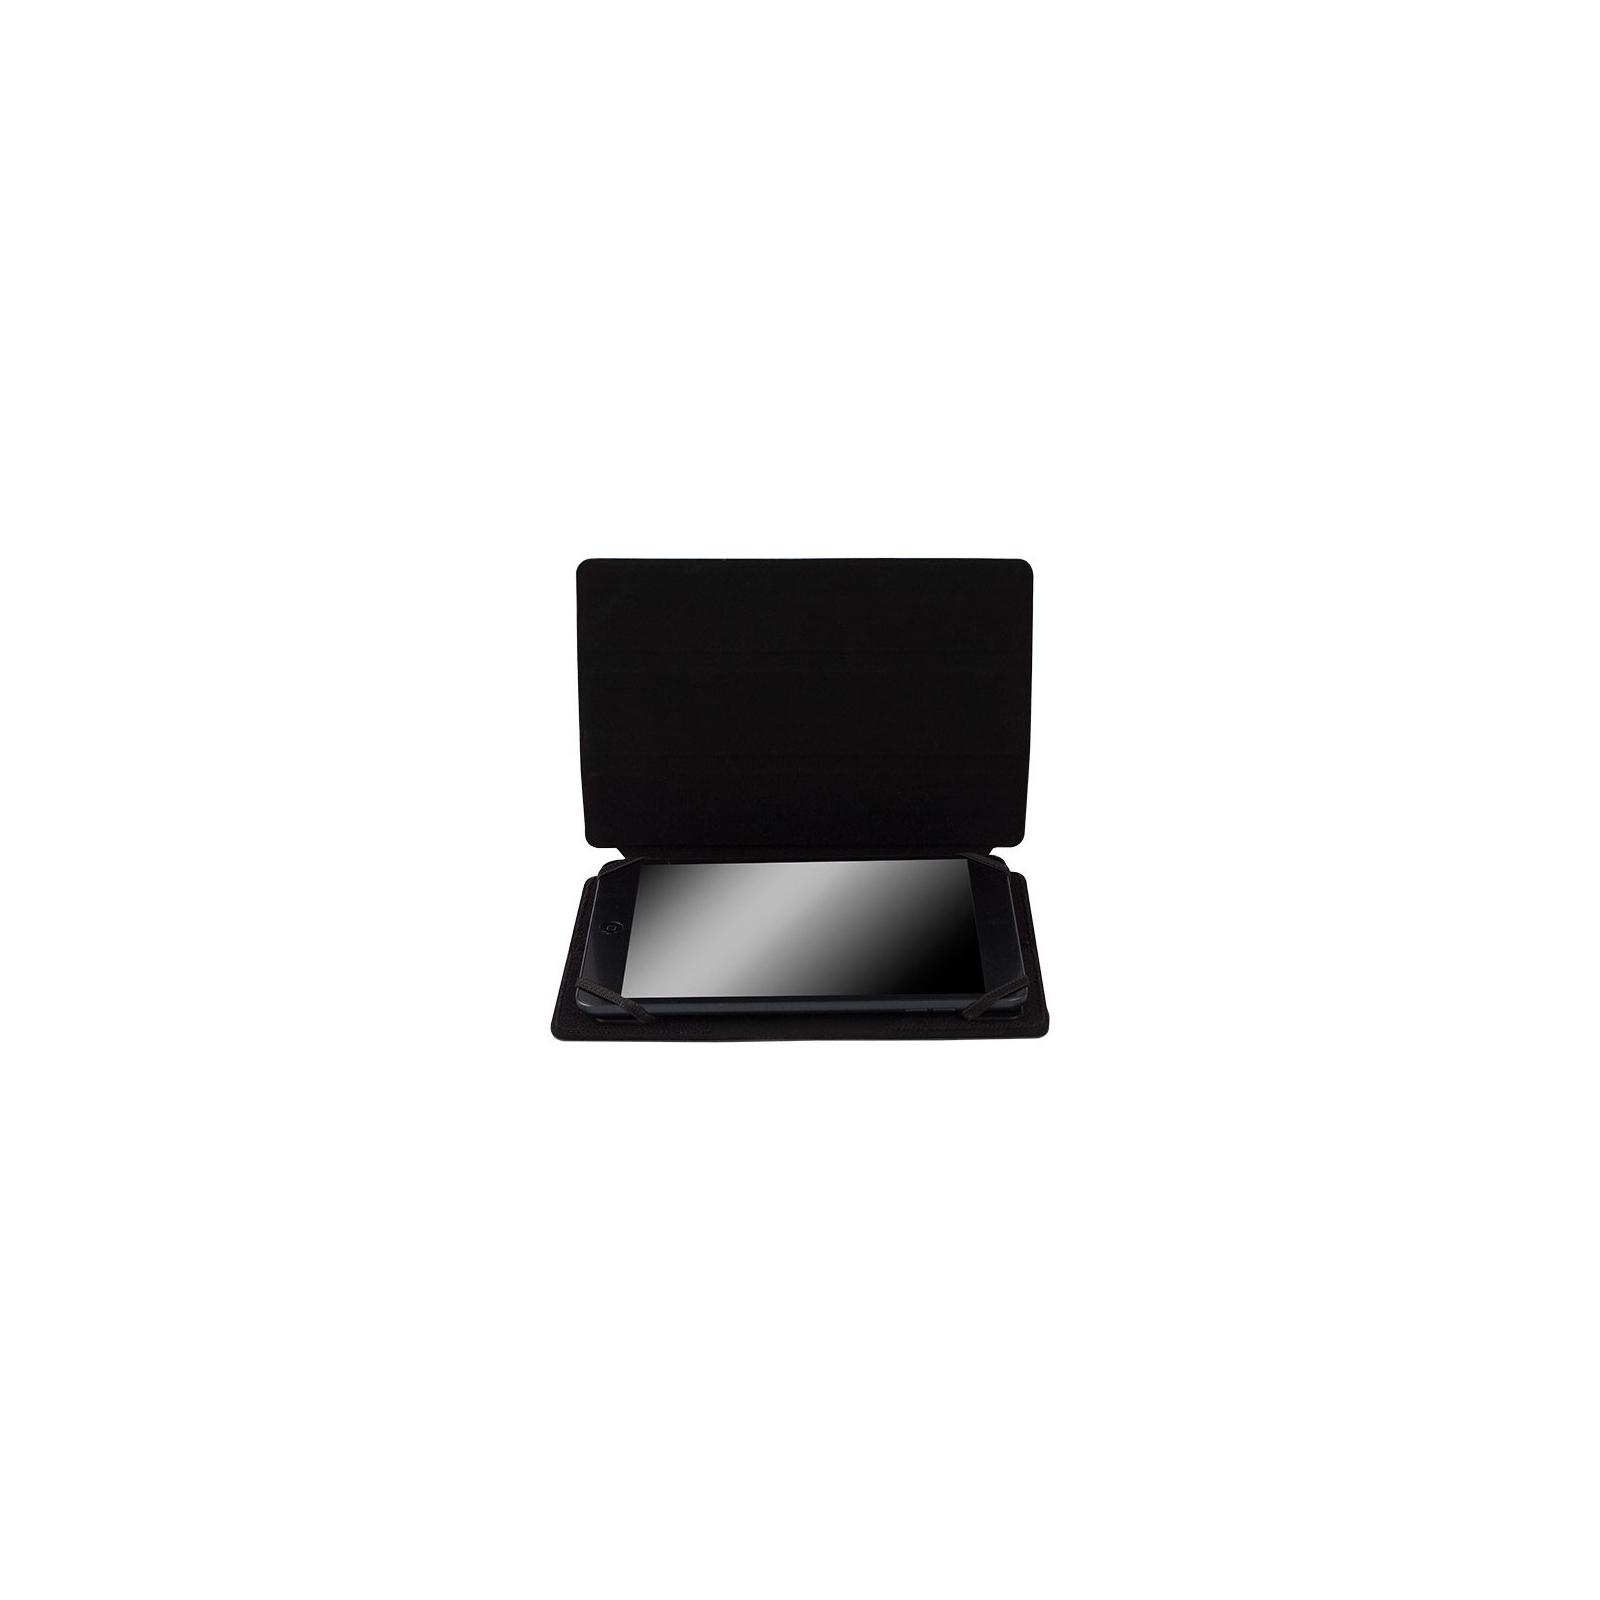 Чехол для планшета Krusell 6-7.9'' Dons Universal Black (71330) изображение 2